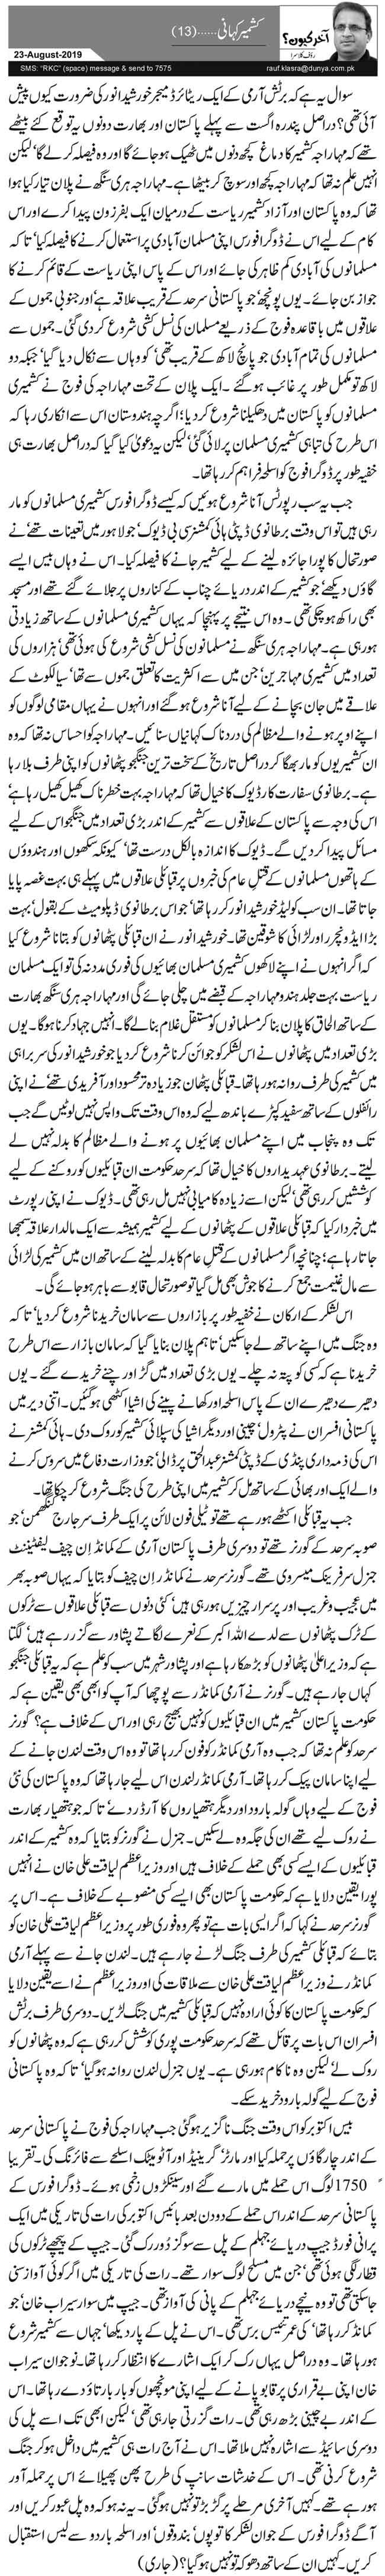 Rauf Klasra column Kashmir Kahani